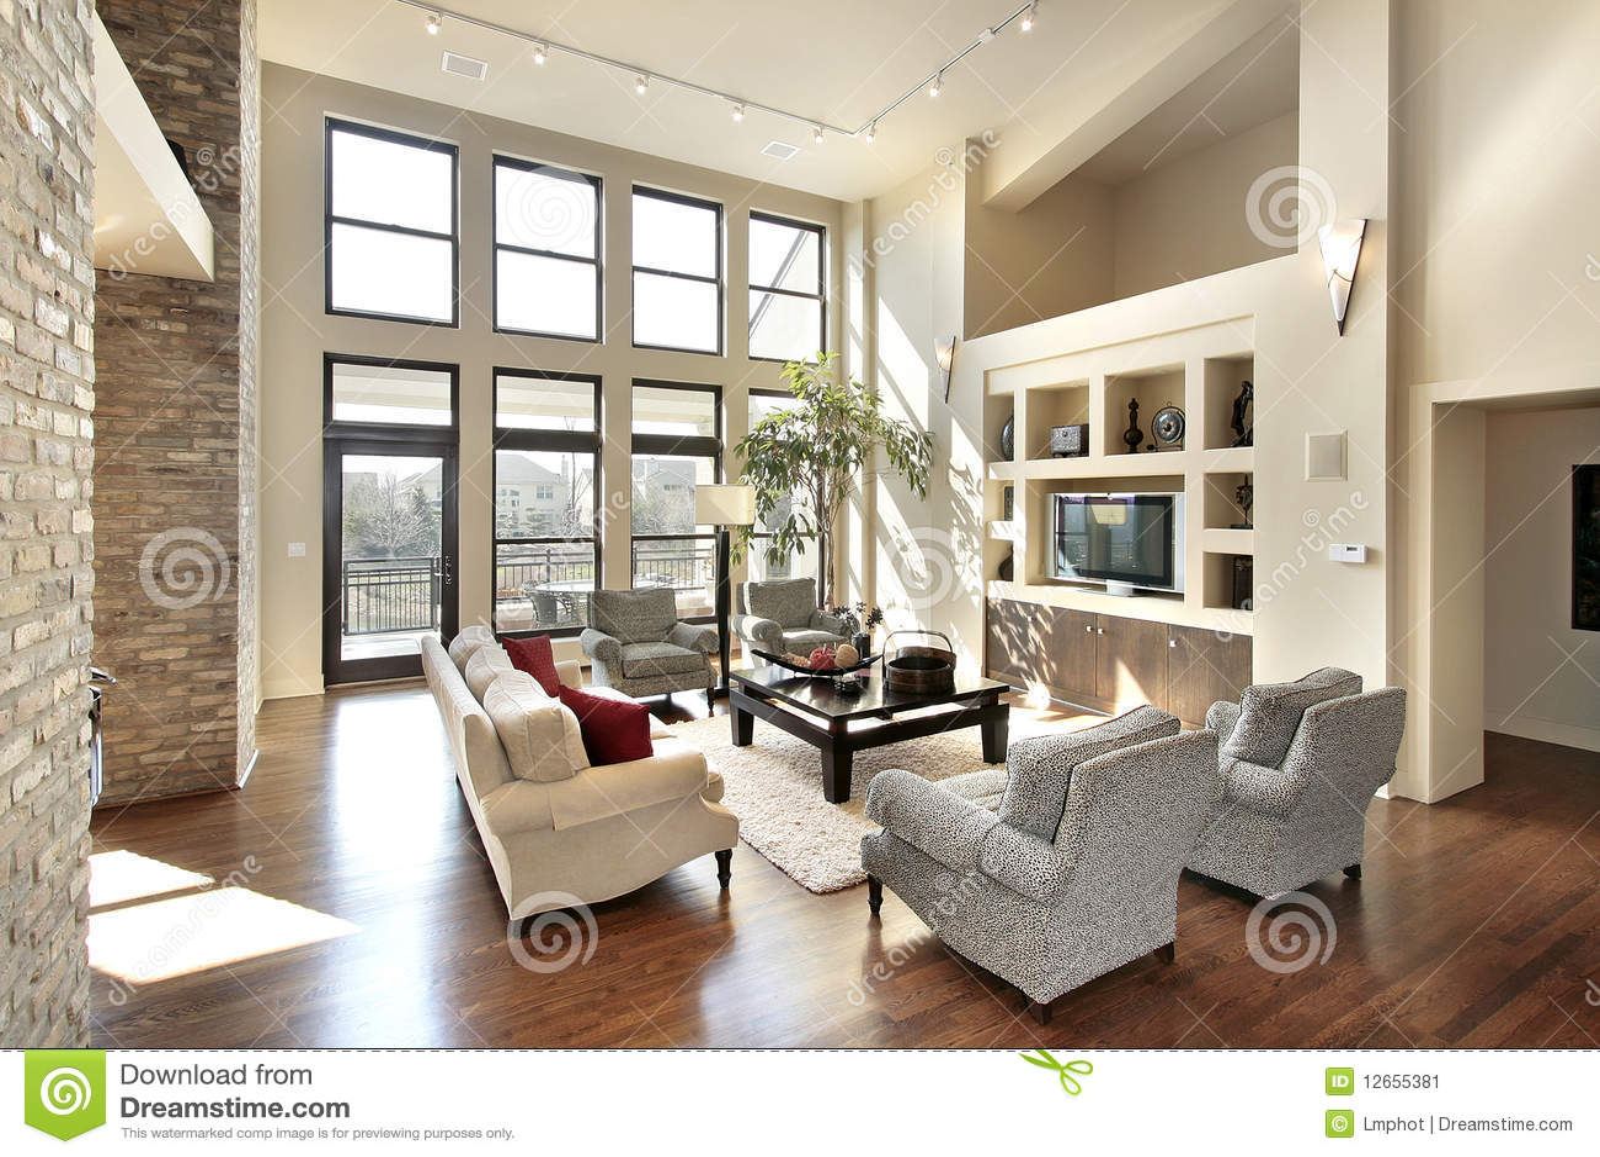 Family Room In Open Floor Plan Stock Image Of Lamp